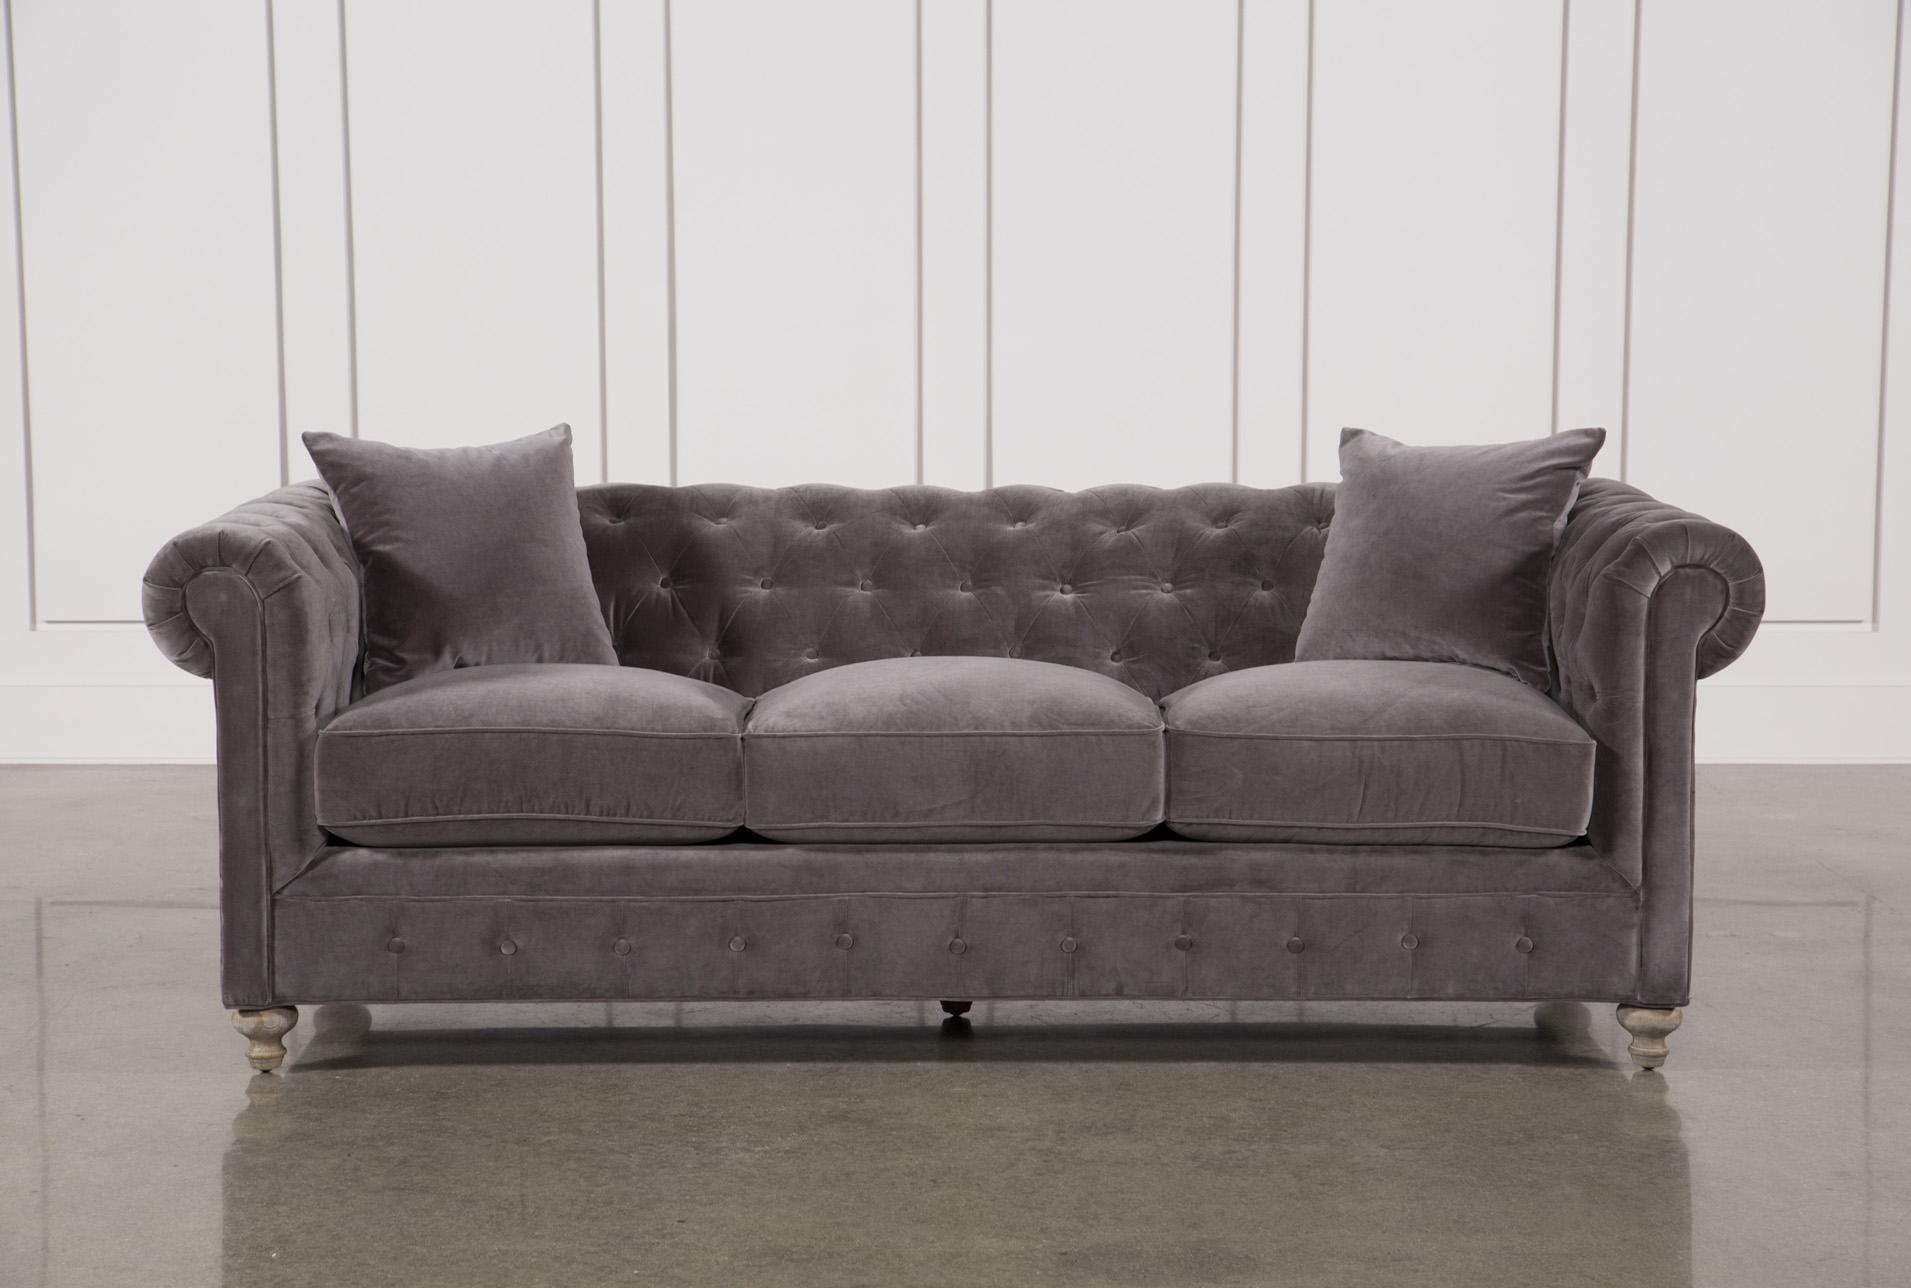 Mansfield 96 Inch Graphite Velvet Sofa In 2018 | Products Inside Mansfield Graphite Velvet Sofa Chairs (Image 11 of 25)